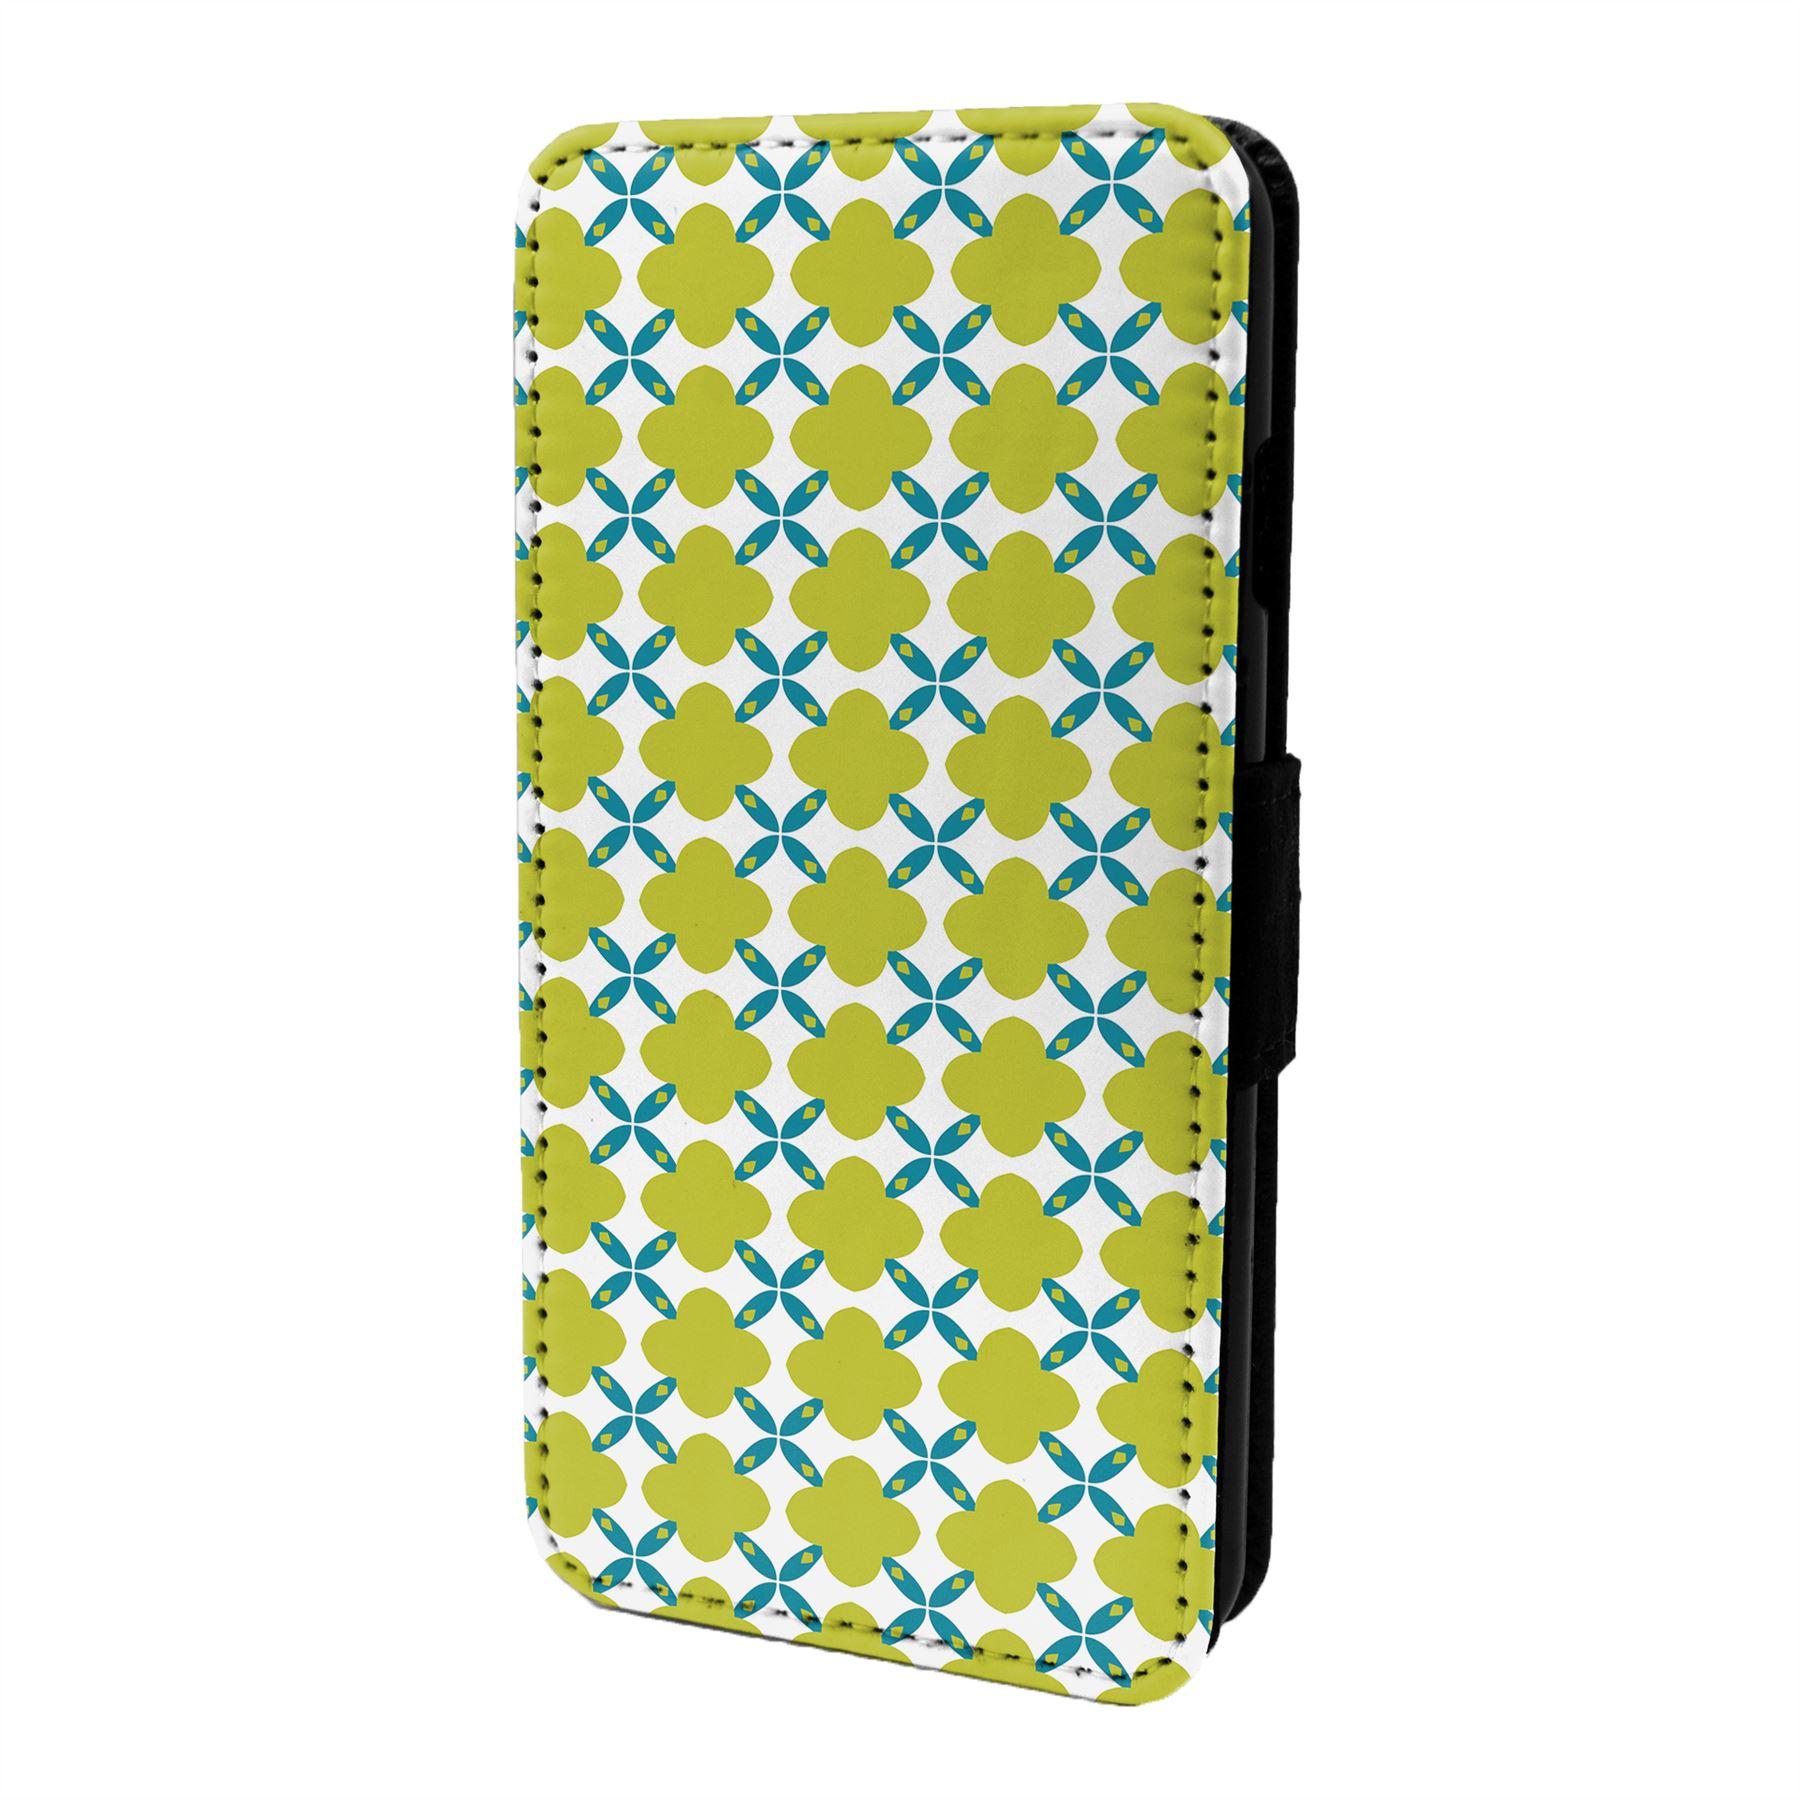 Vintage-Patron-Geometrico-Funda-Libro-para-Telefono-Movil-S7153